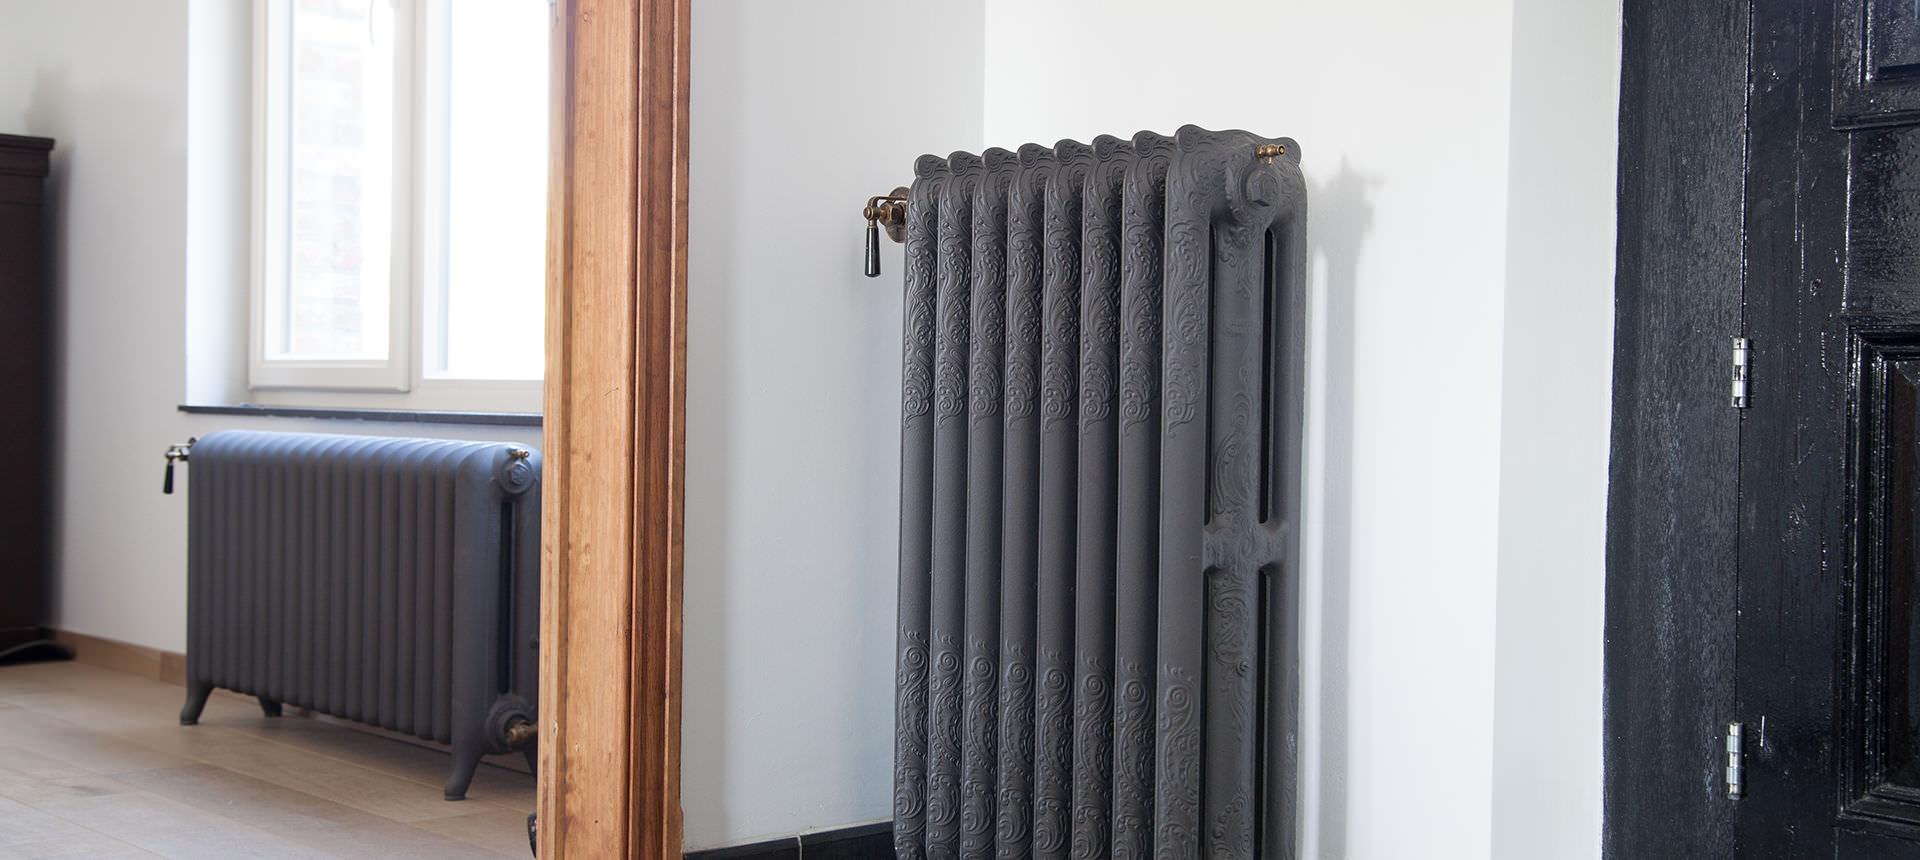 radiateur fonte alu eau chaude best radiateur en fonte. Black Bedroom Furniture Sets. Home Design Ideas